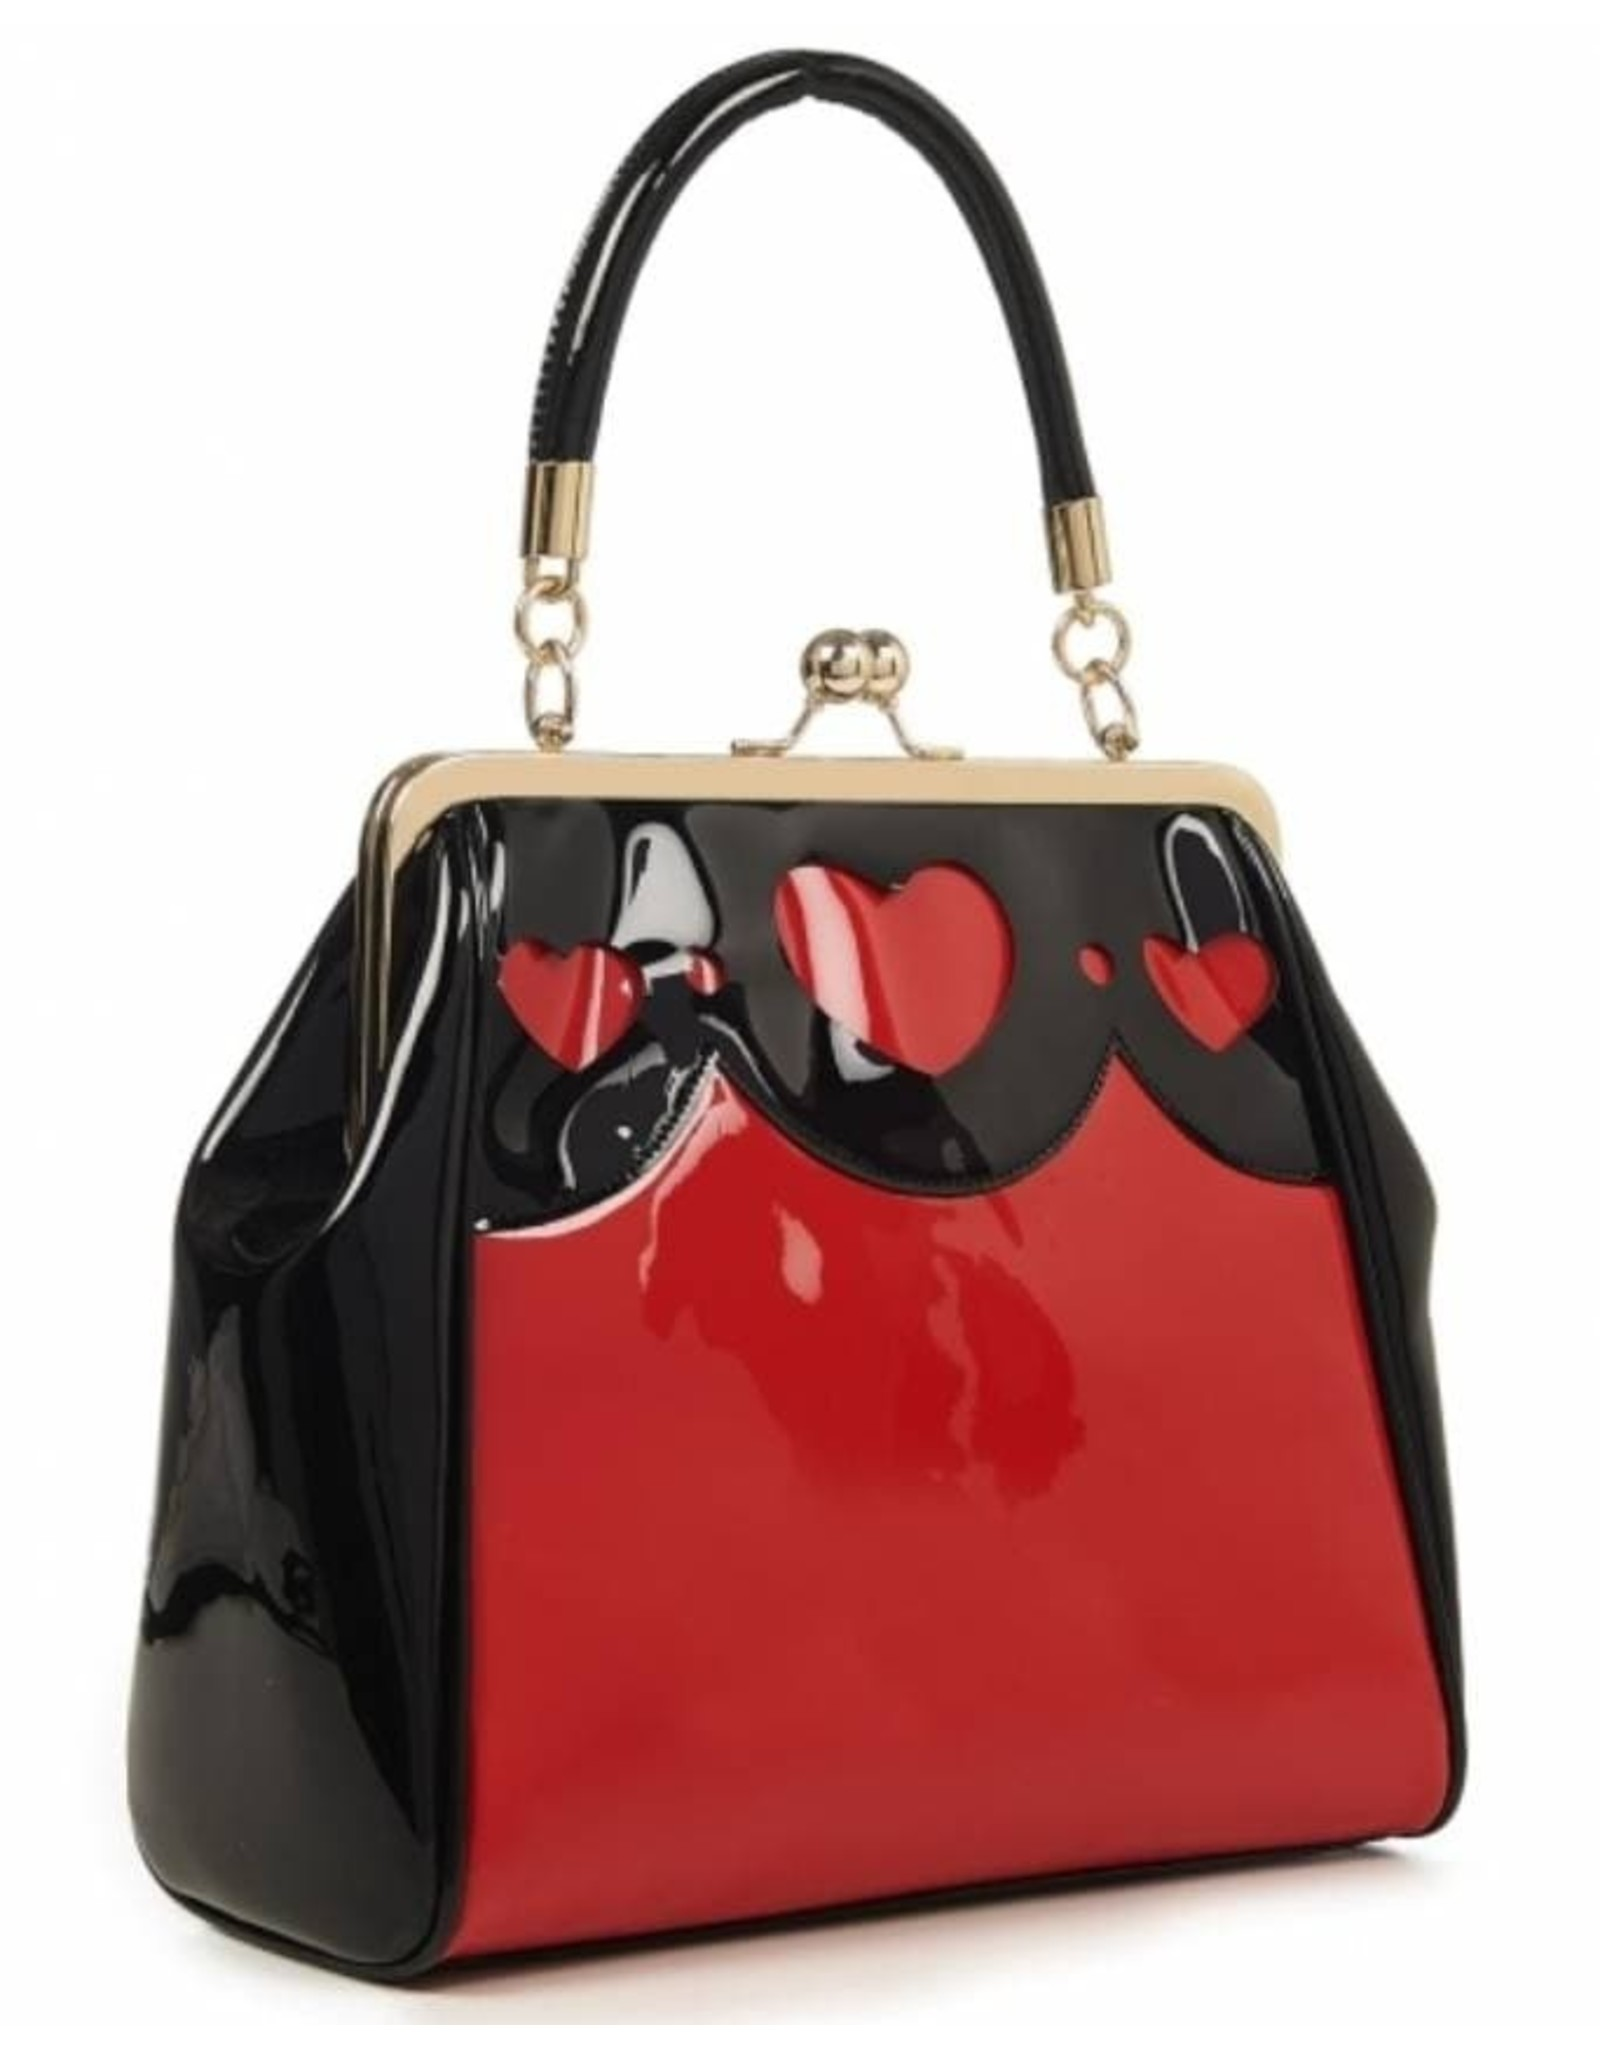 Vintage Retro bags Vintage bags - Banned Heartbraker Retro handbag Red